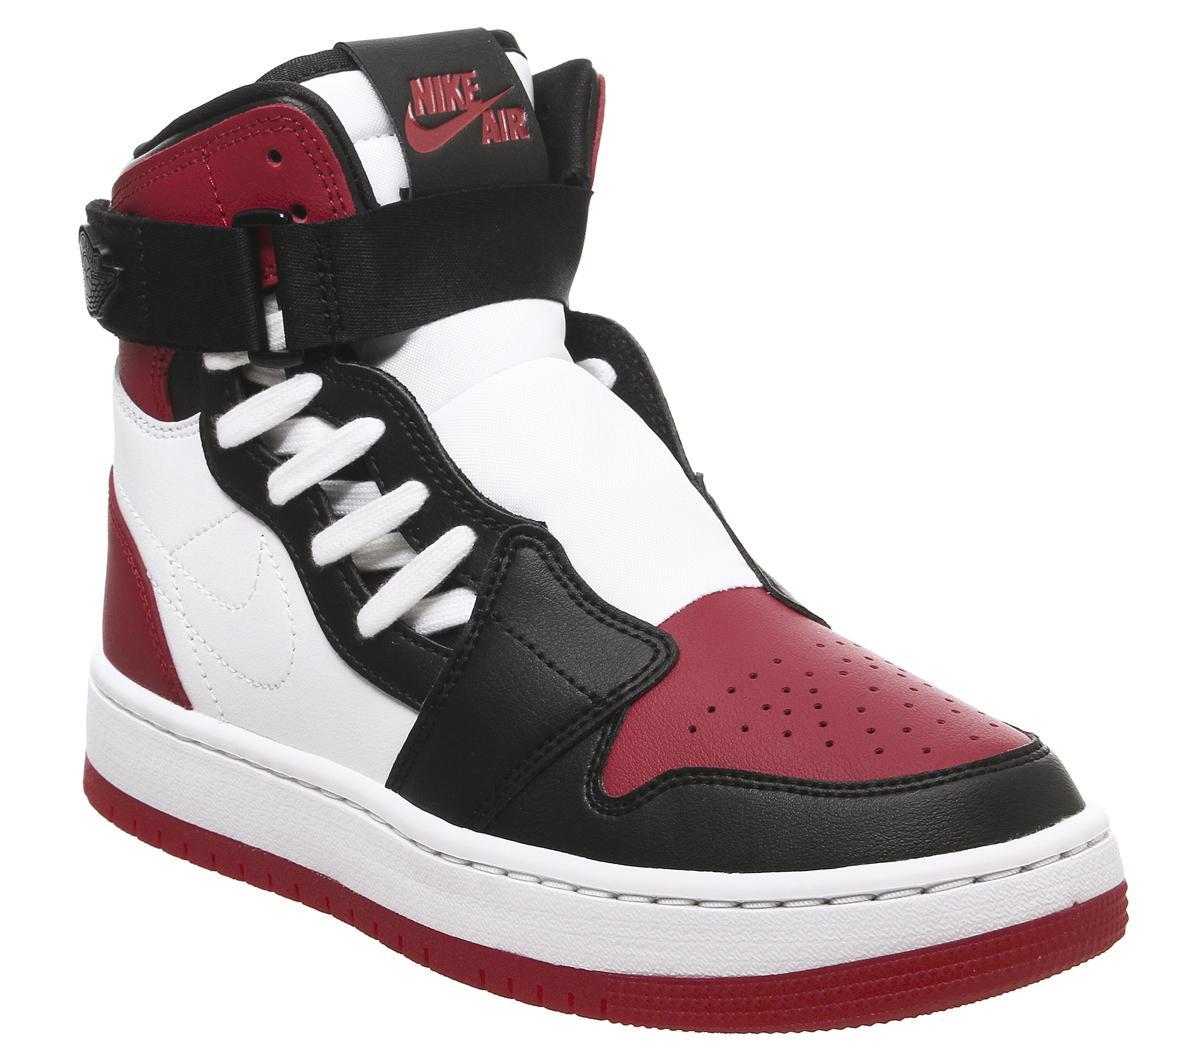 Air Jordan 1 Nova Xx Trainers